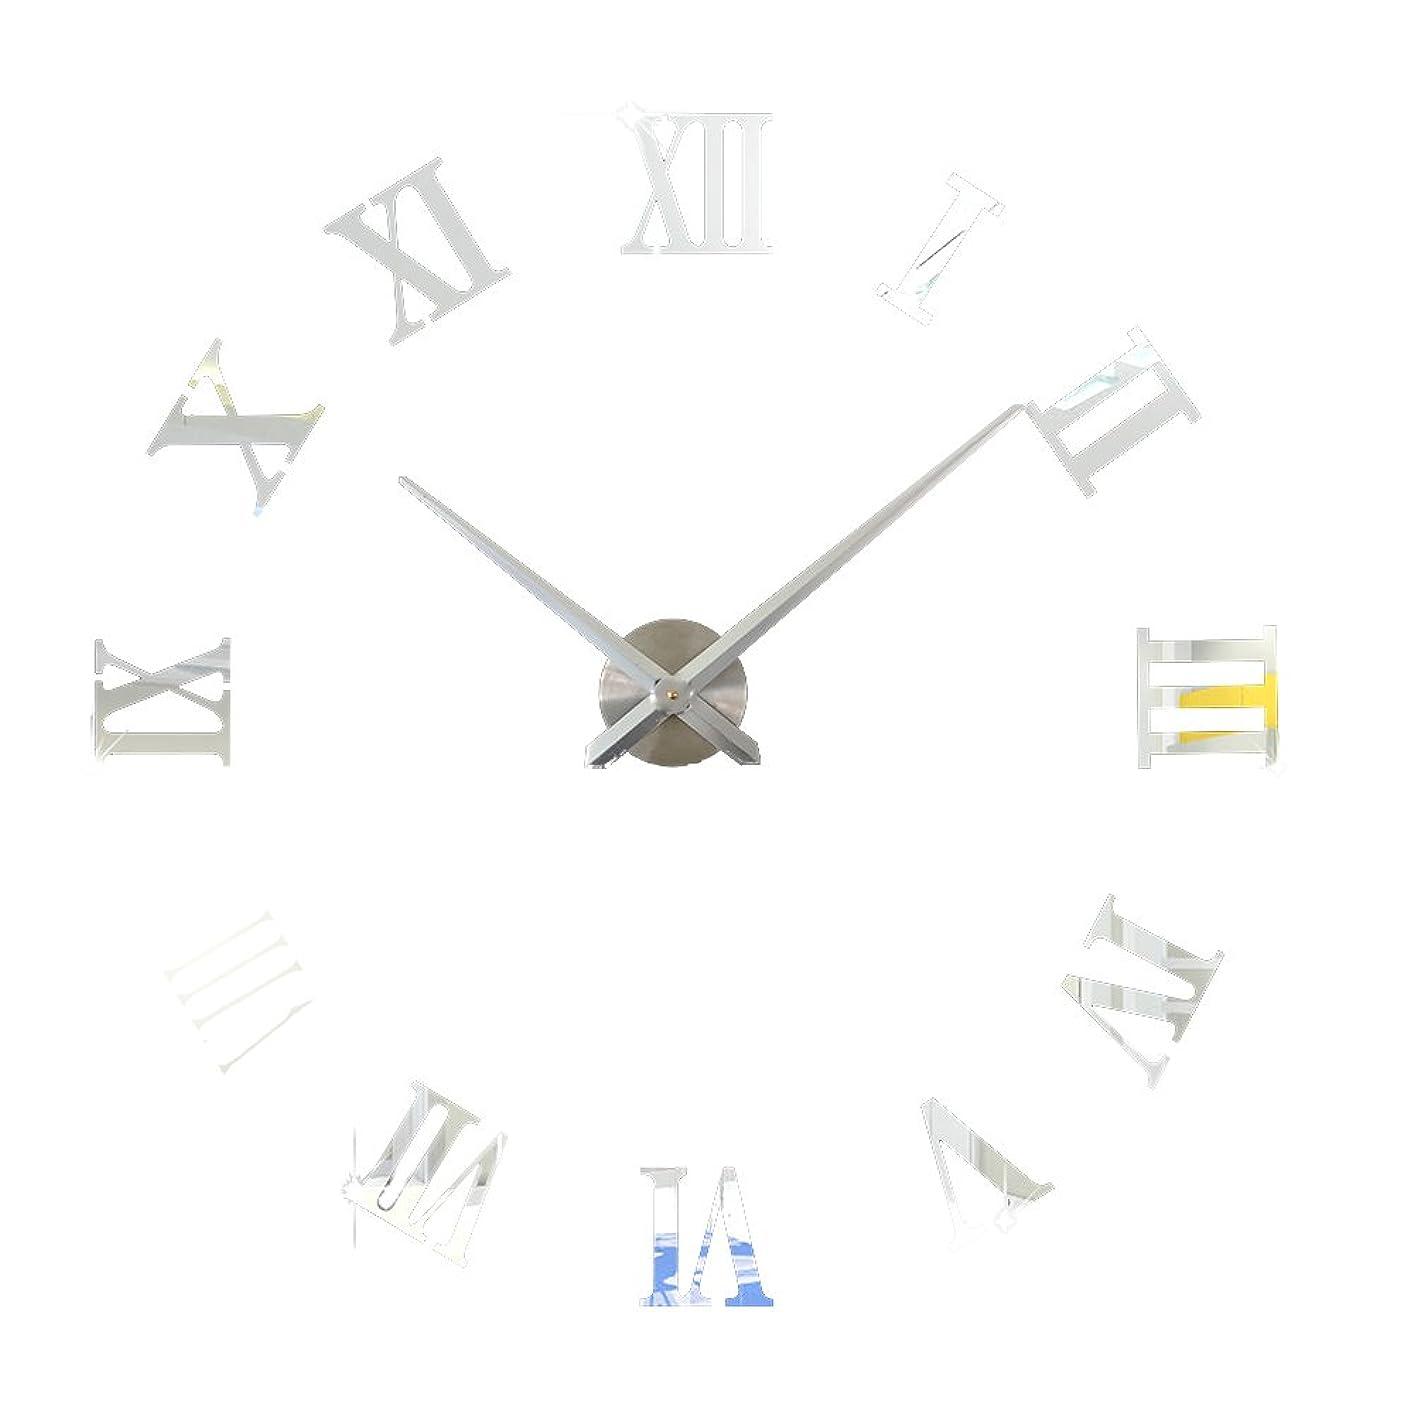 WINOMO Frameless Large Roman Numerals DIY Acrylic Mirror Wall Clock DIY Clock Kit pbkzwfmxyyq427